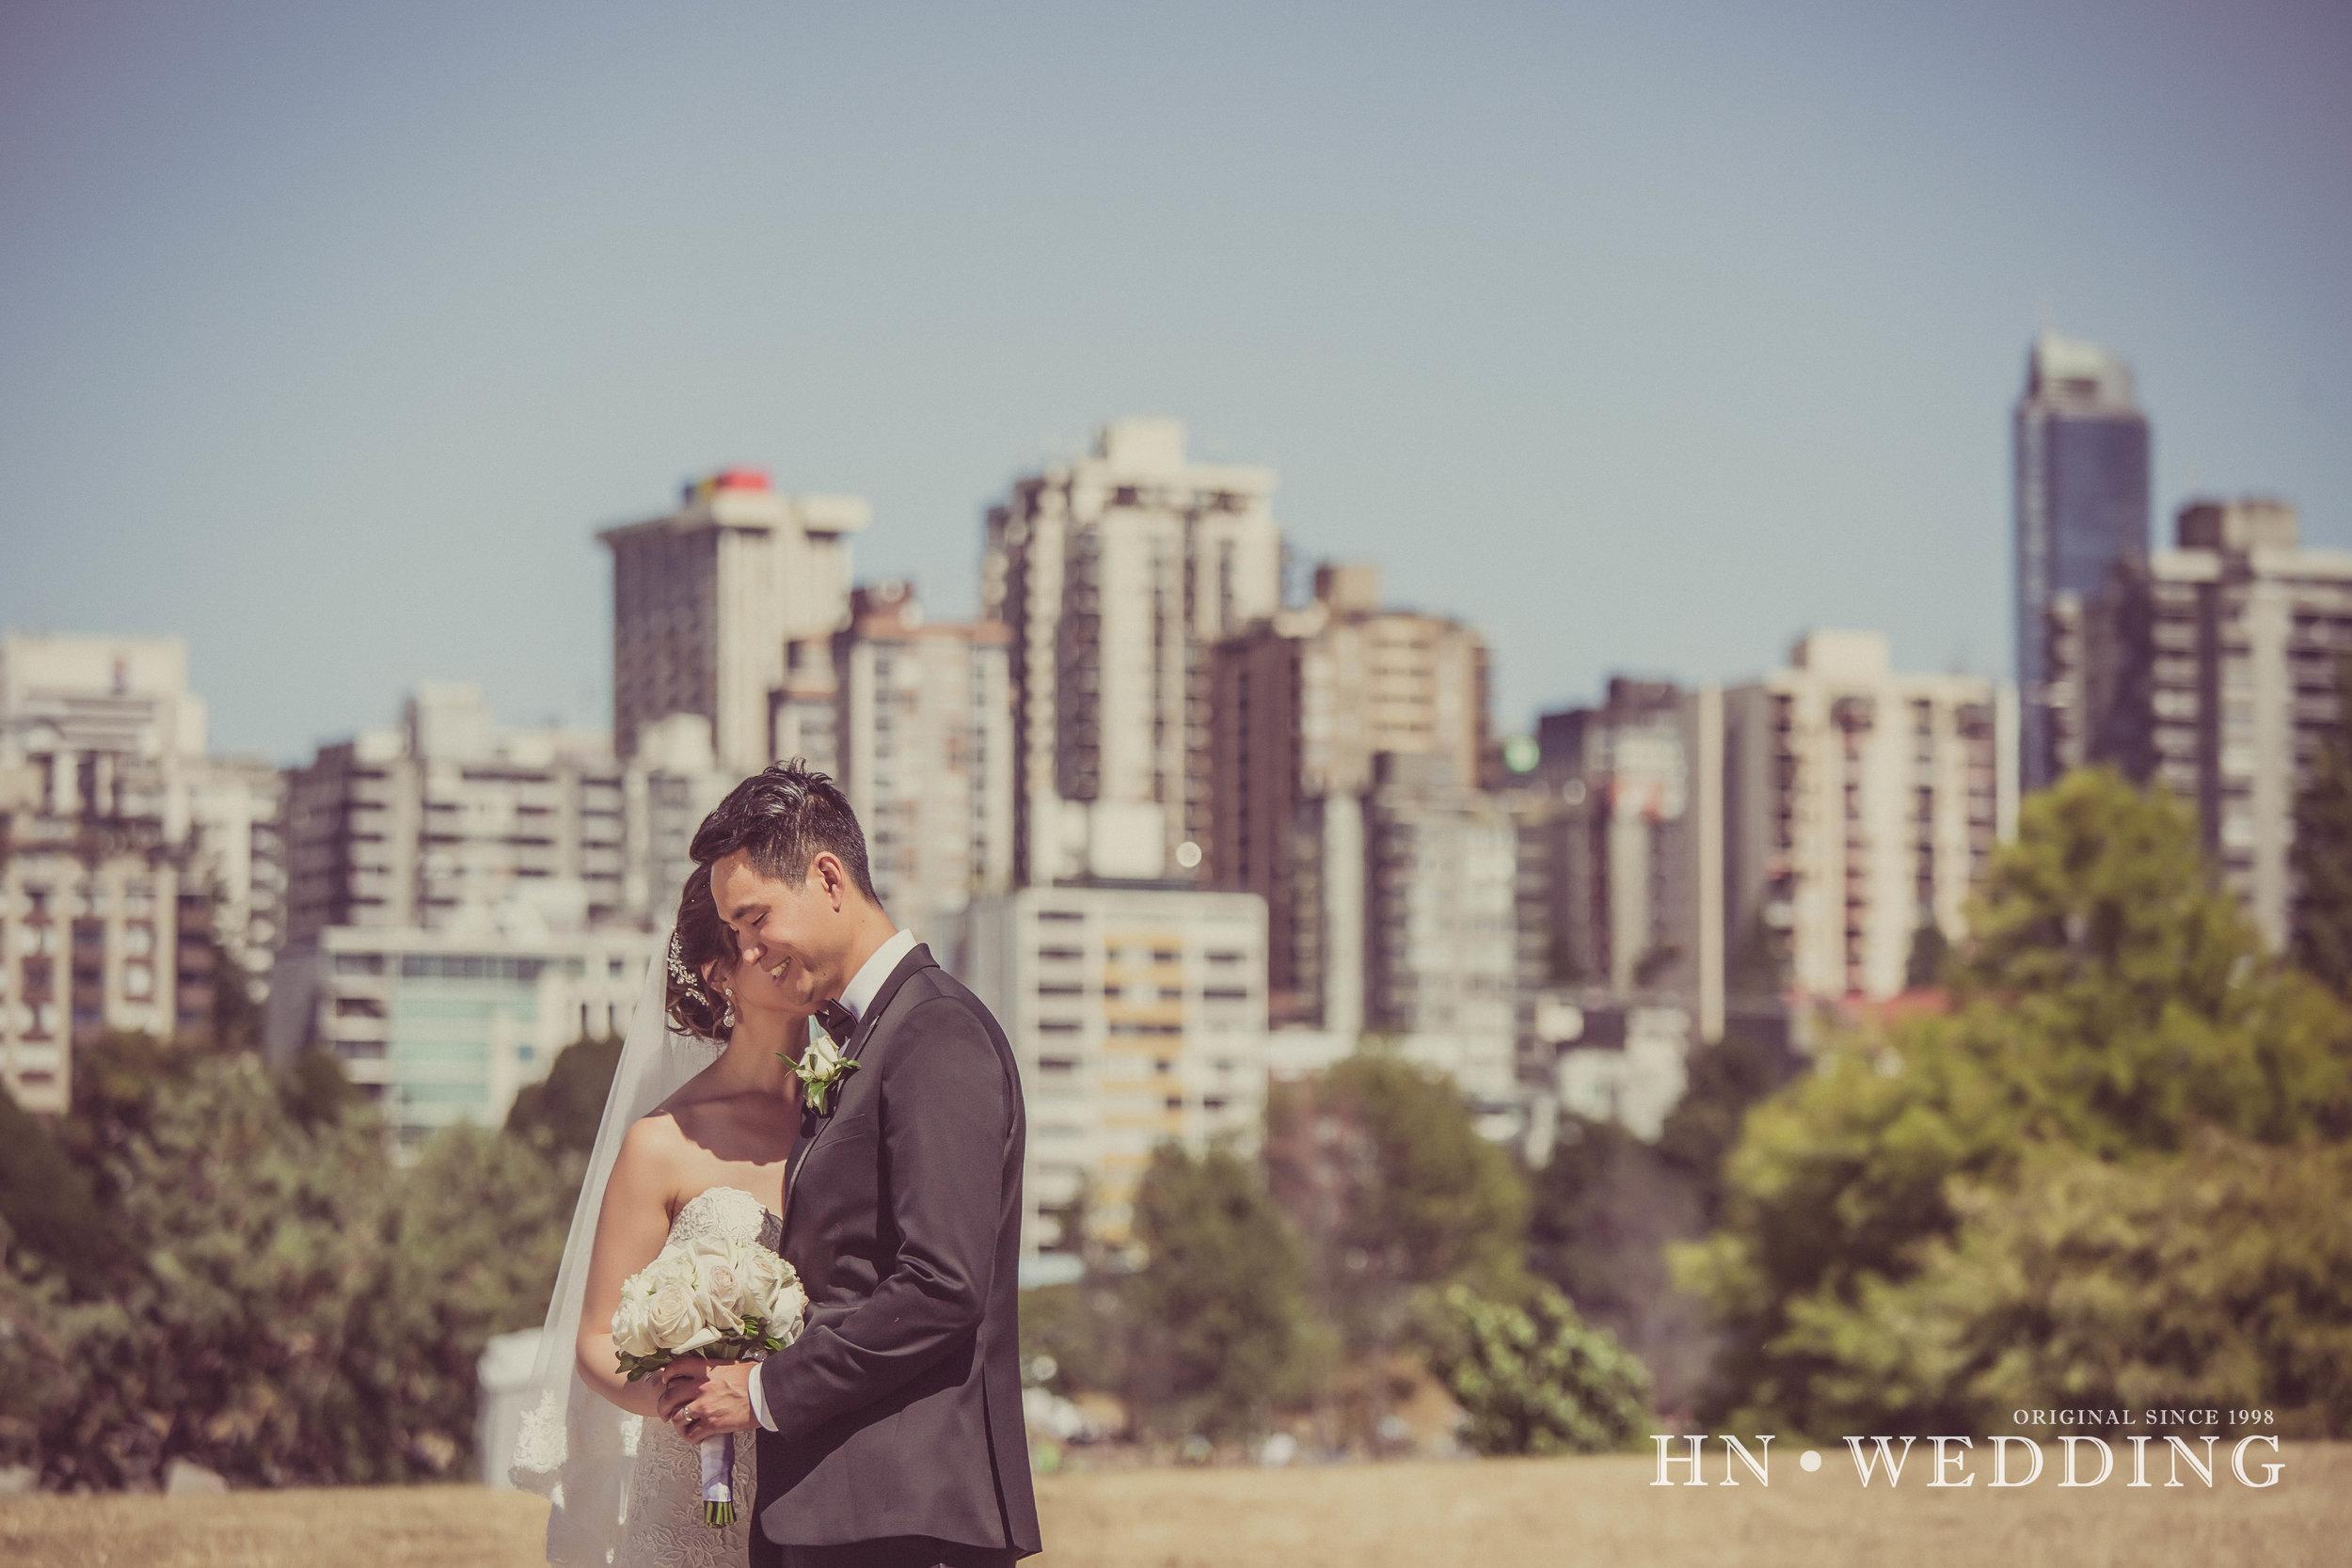 HNwedding-weddingday-20170729--58.jpg